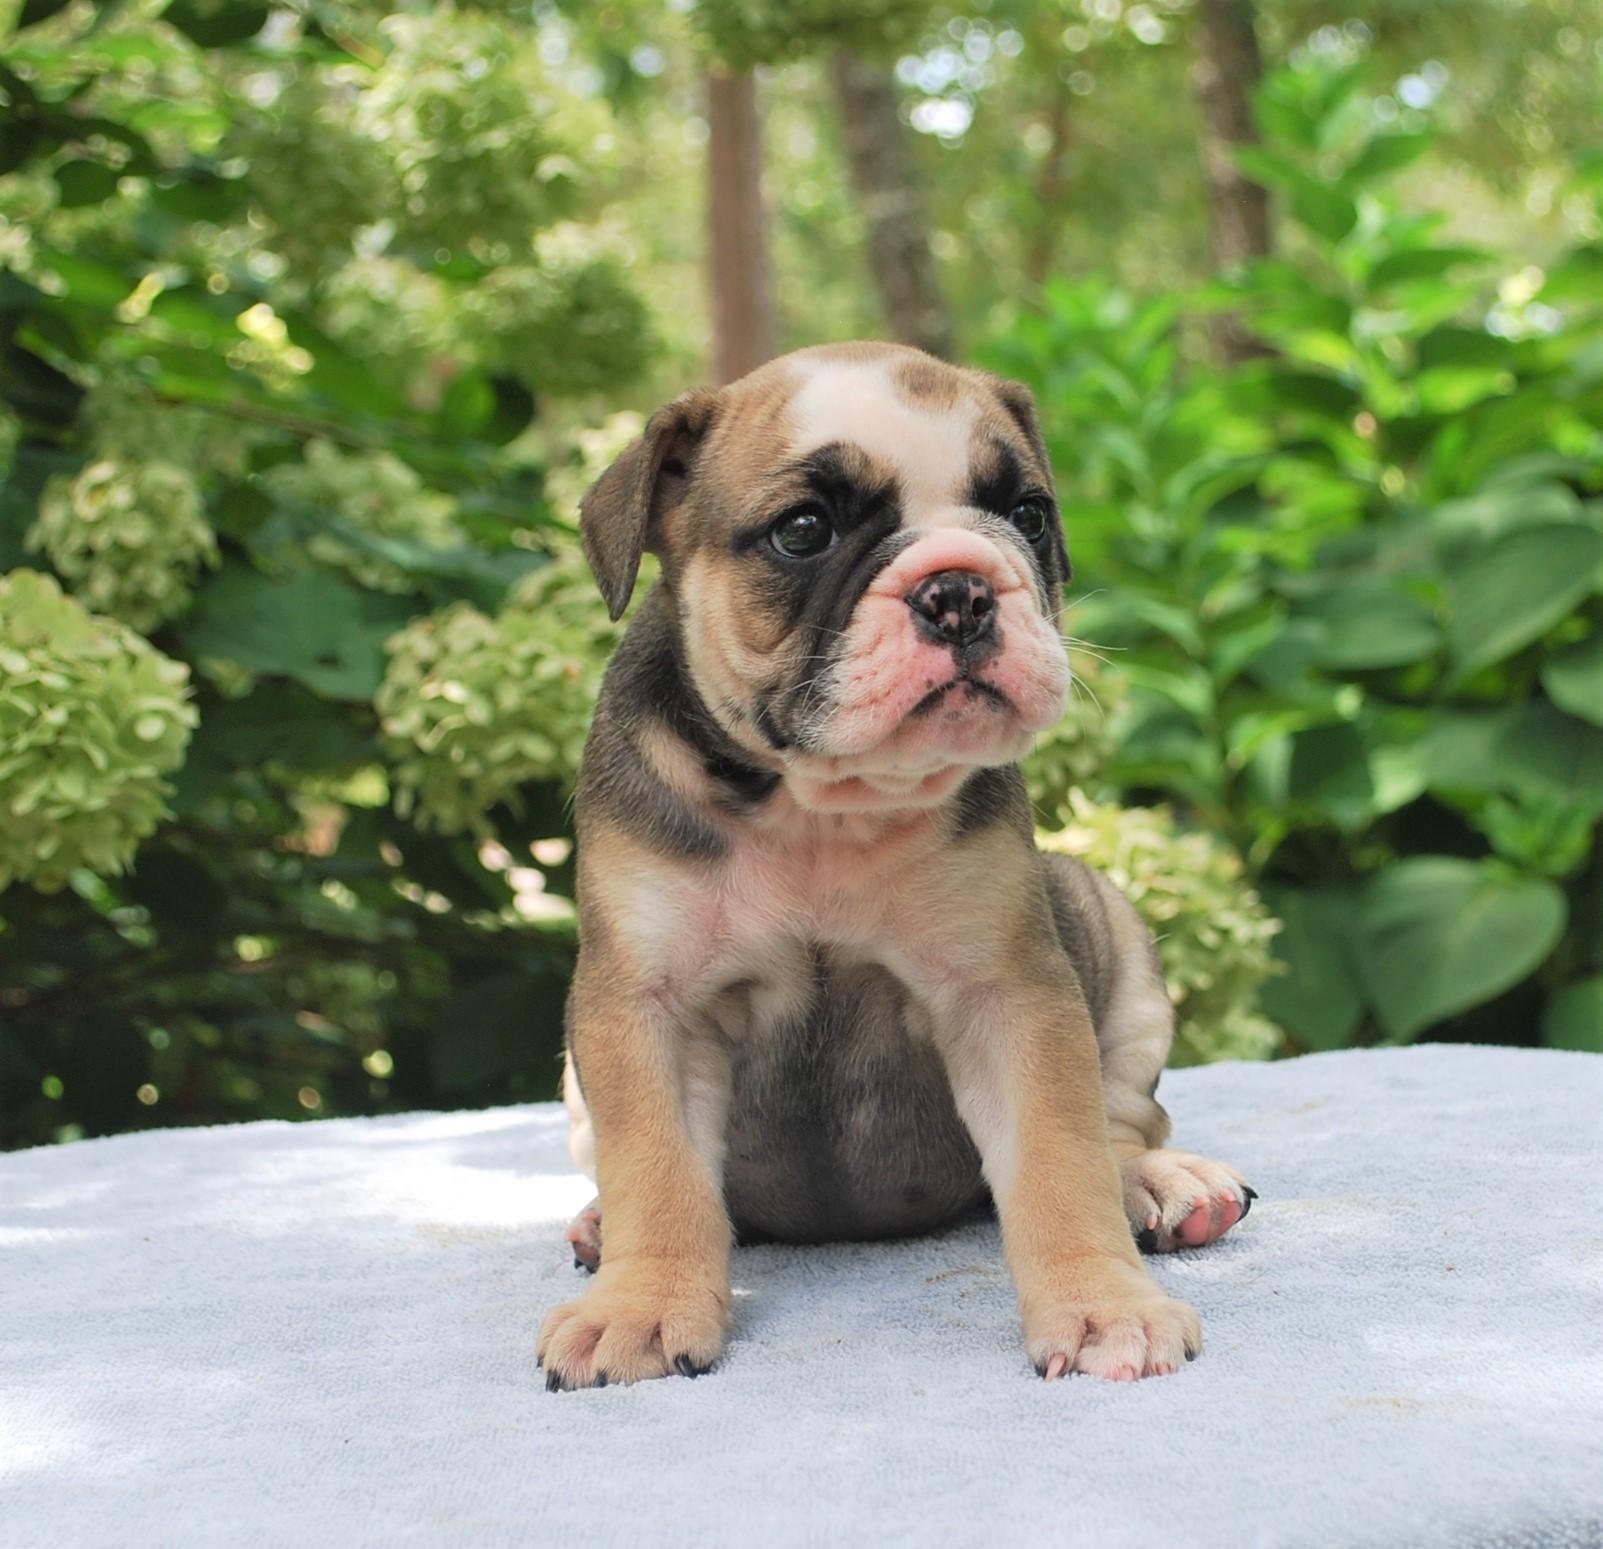 Olde English Bulldogge Puppies For Sale In Atlanta